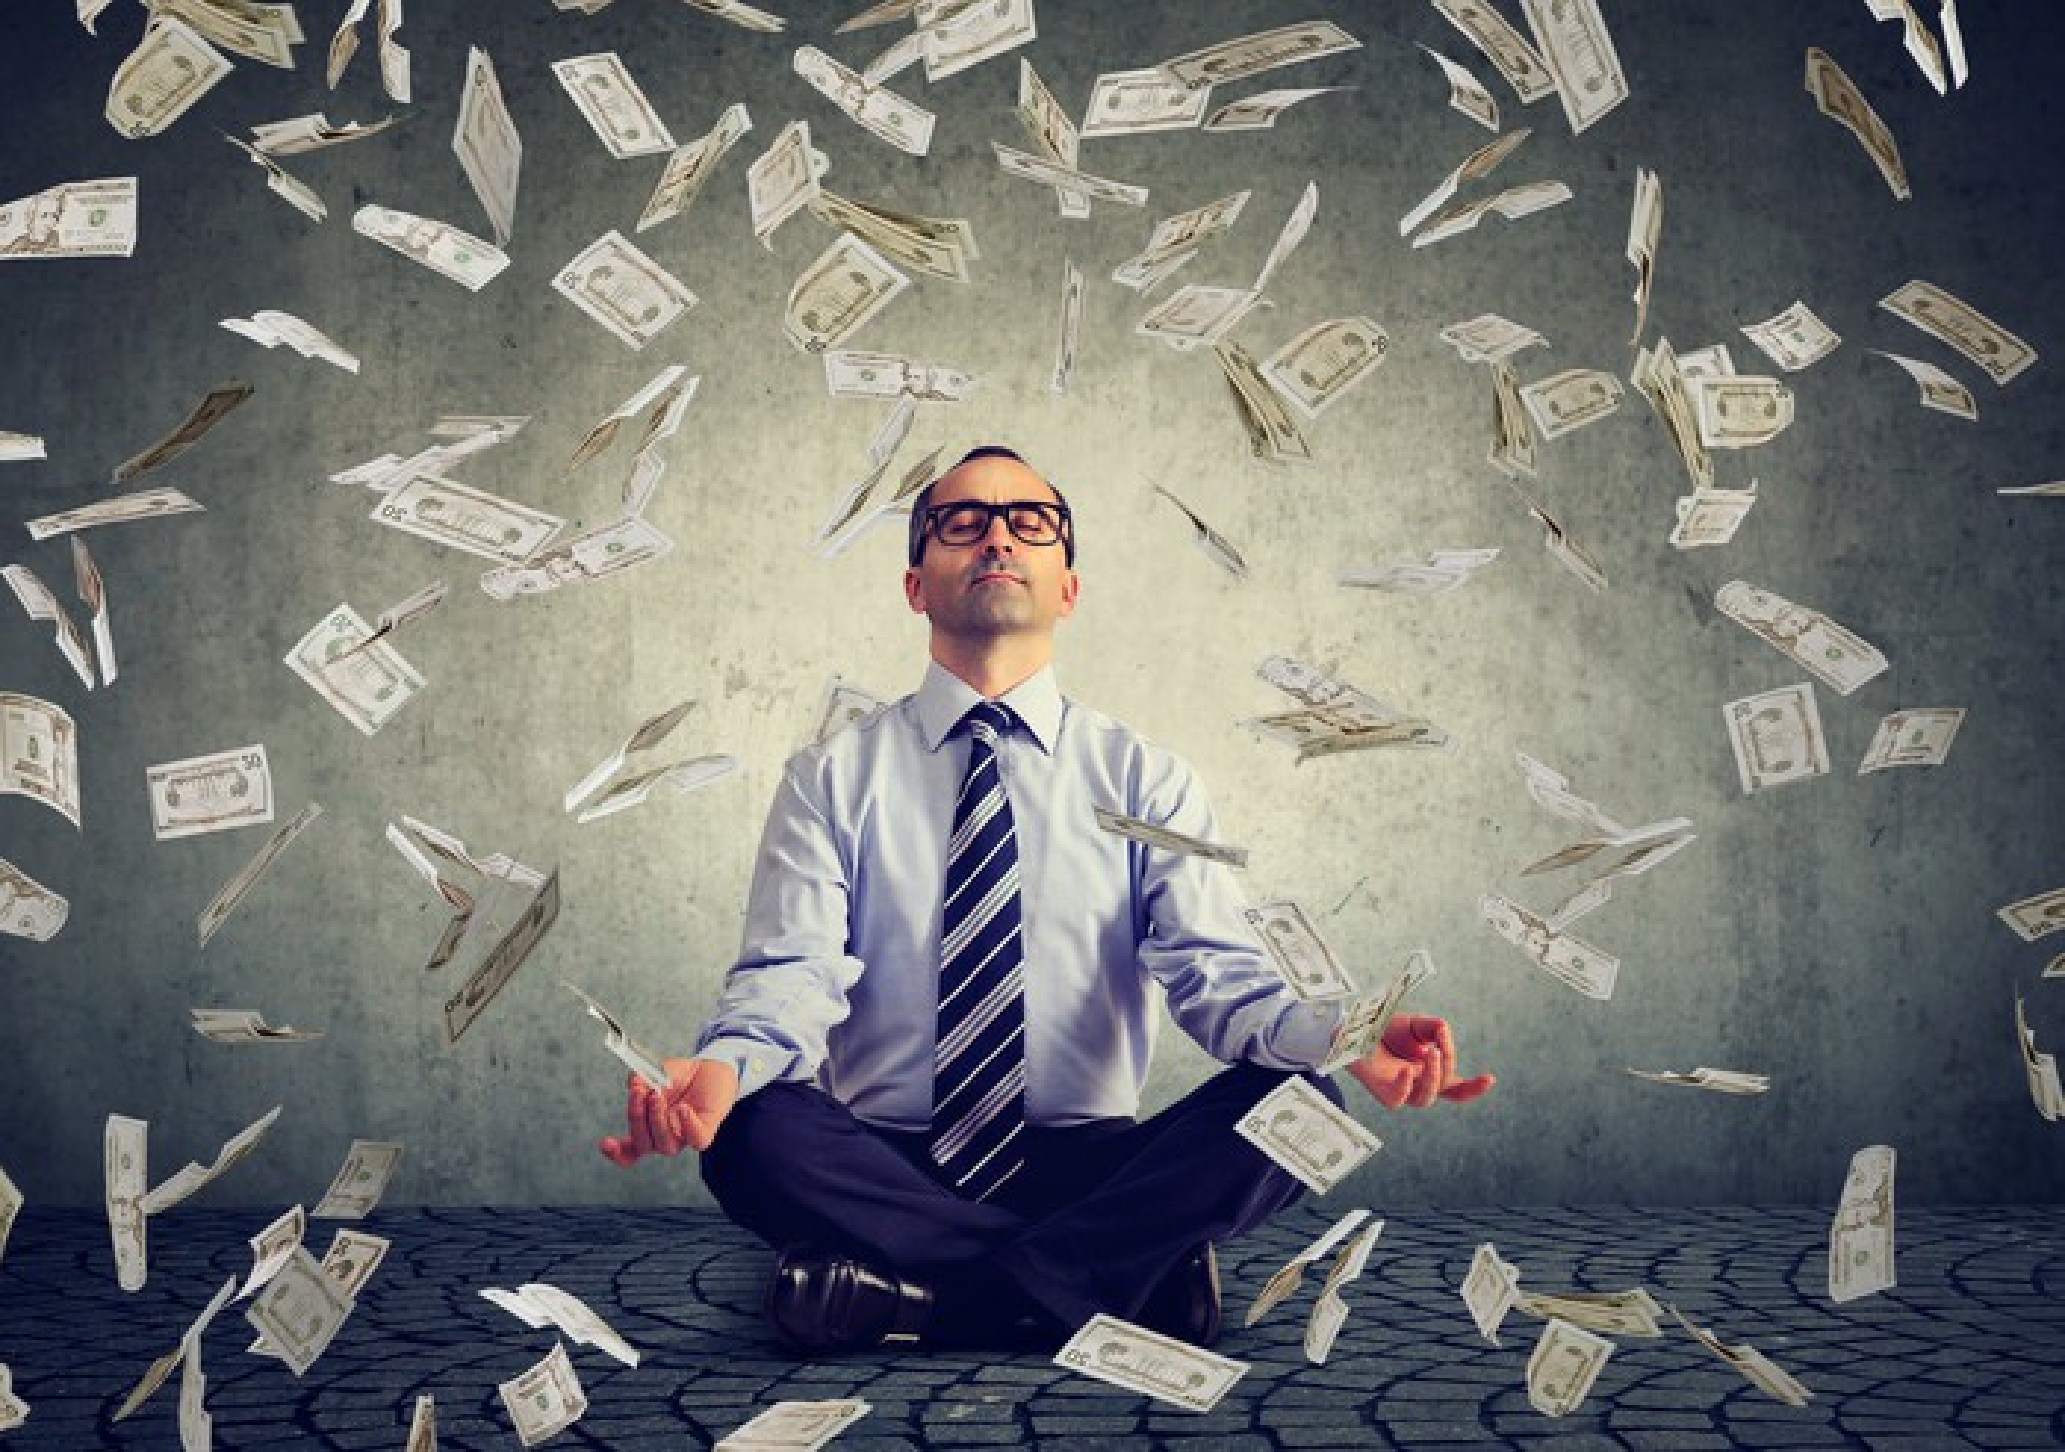 A man sits in a yoga pose as dollar bills fall down around him.